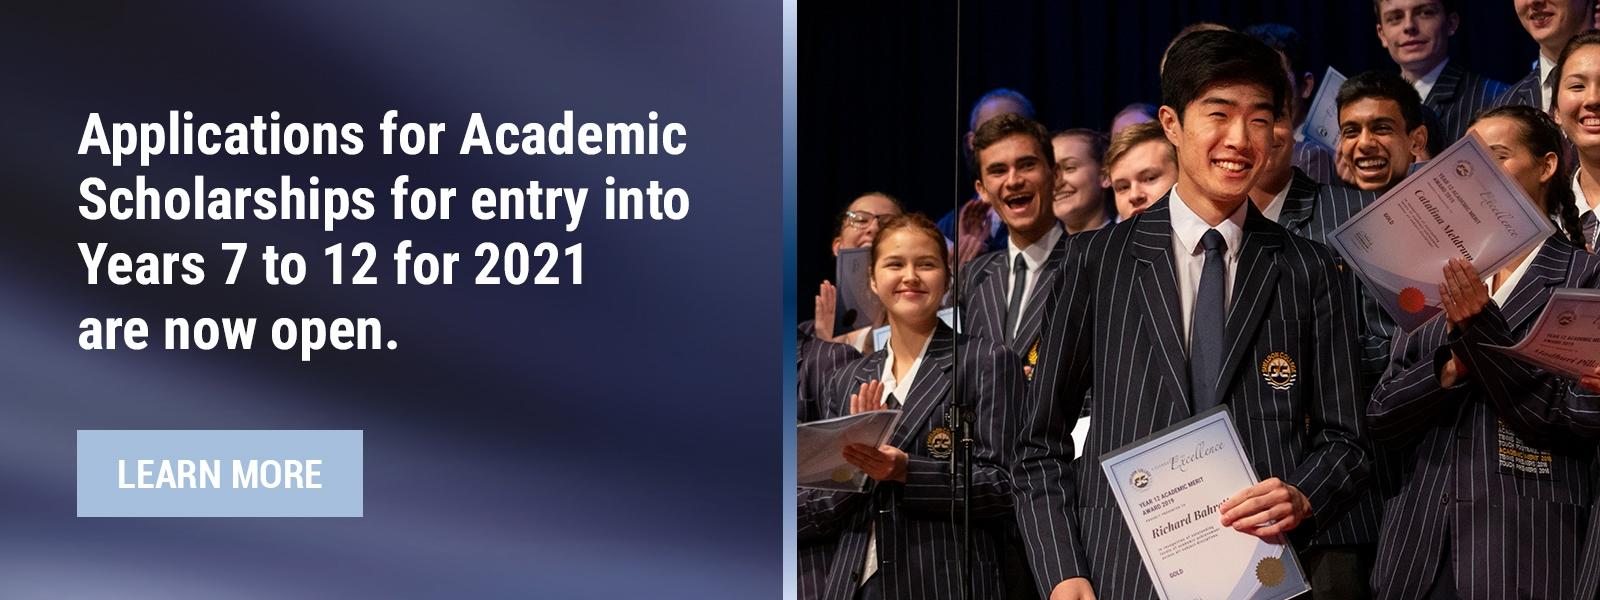 https://www.sheldoncollege.com/academic/scholarships